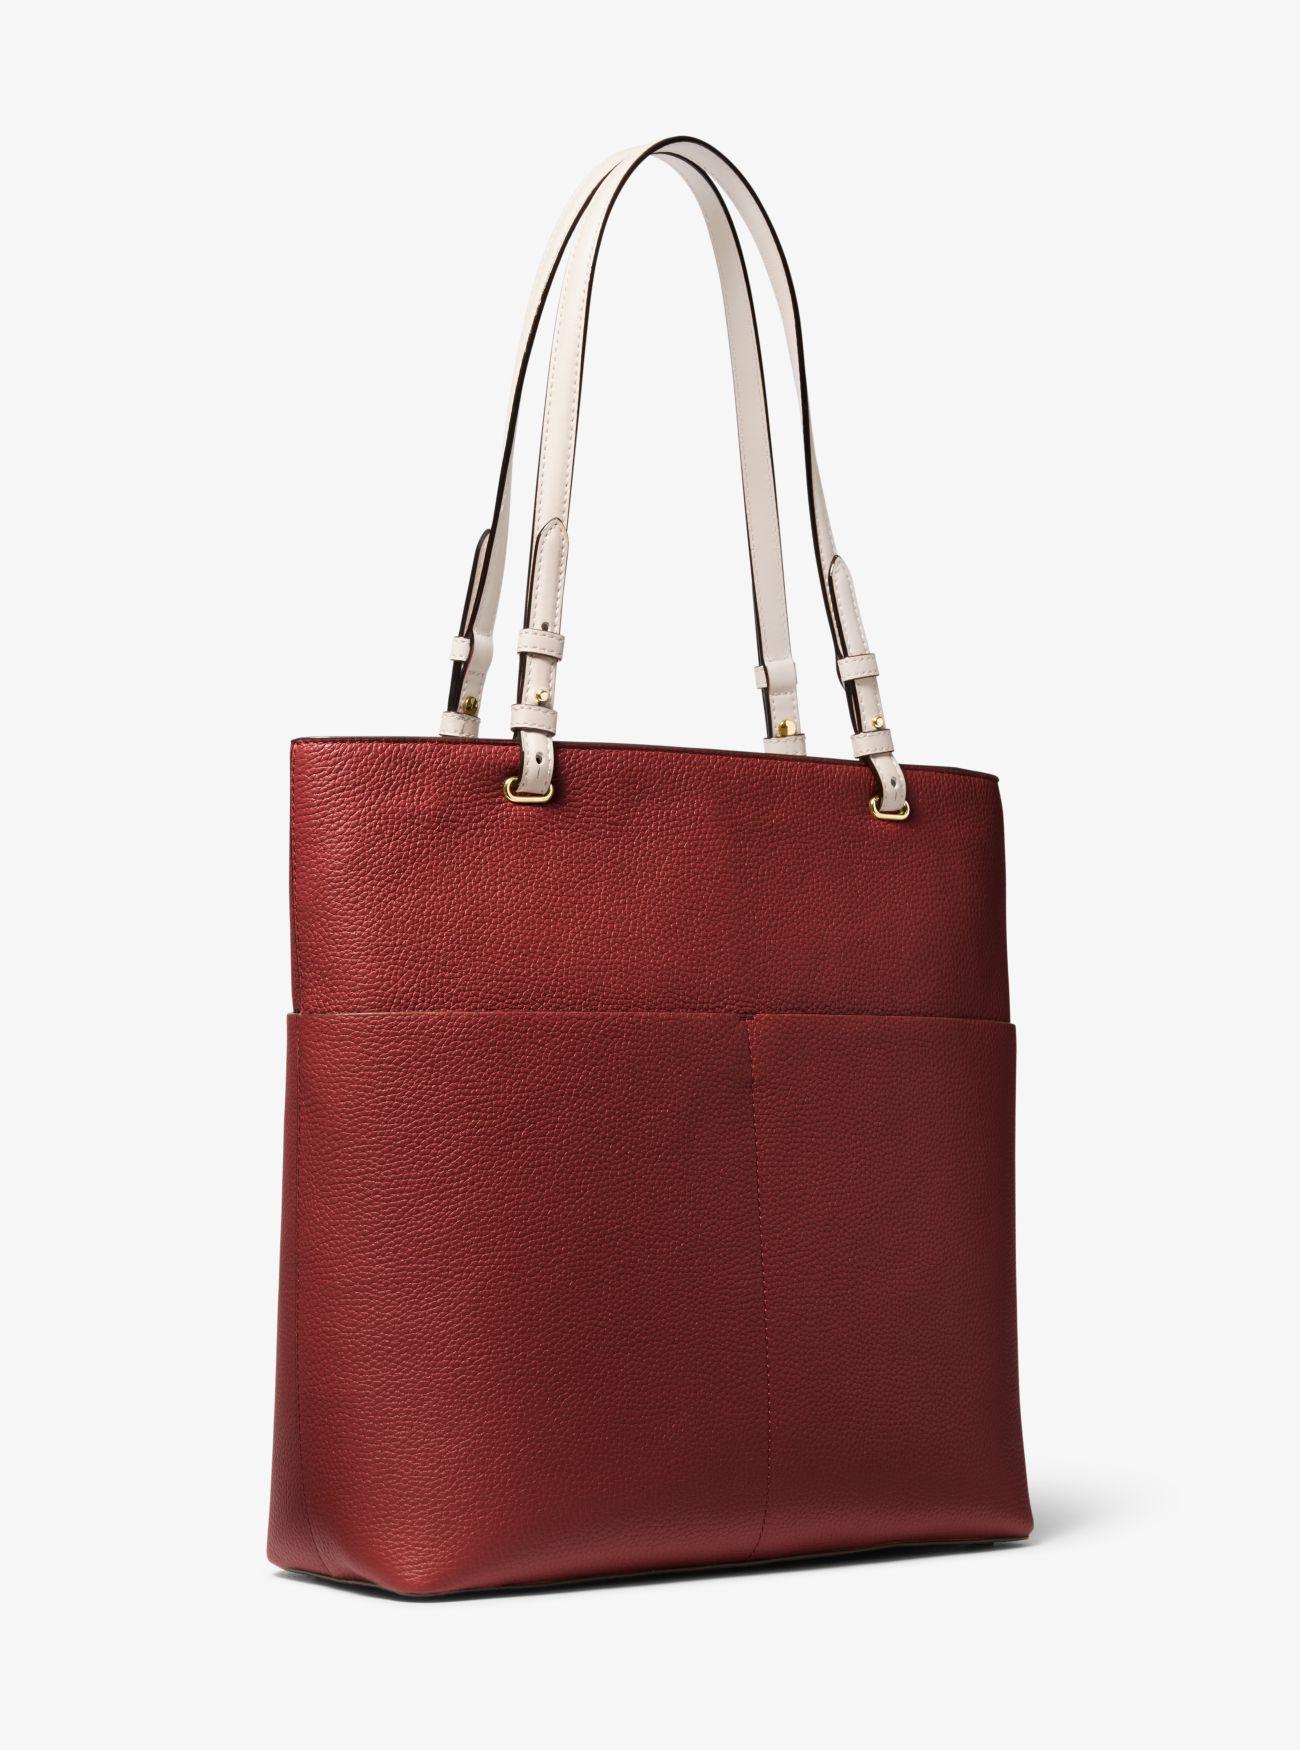 Michael Kors Bedford Large Pebbled Leather Tote Handbag - $76.95 A/C F/S